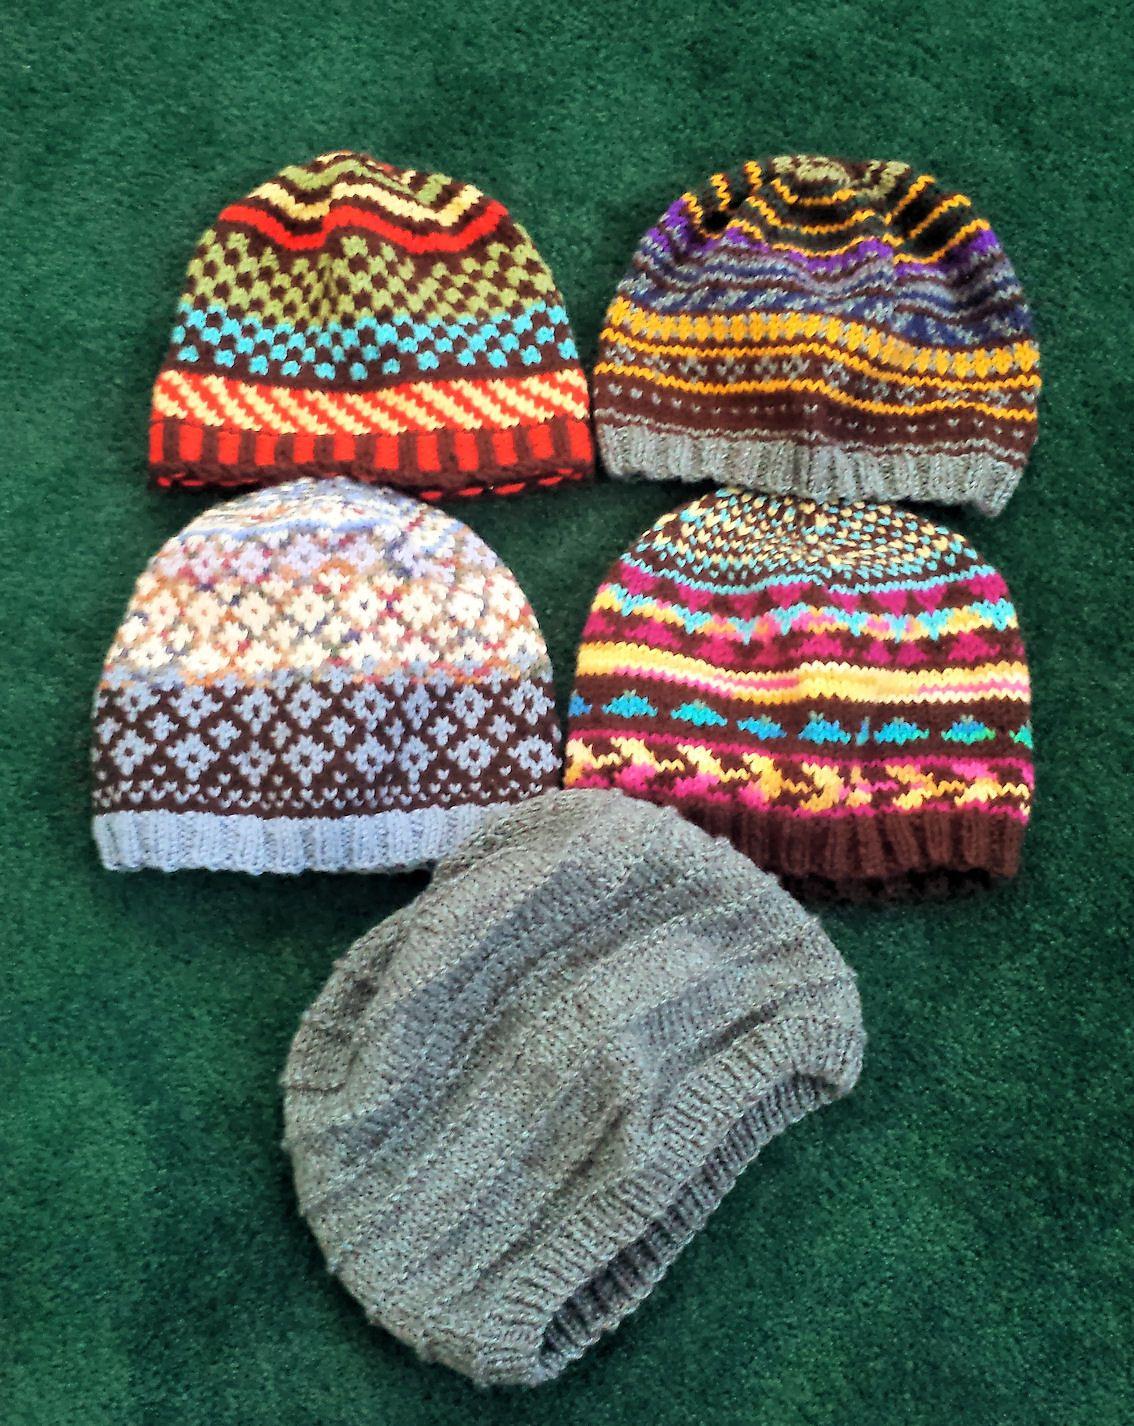 Ravelry: Basic Knit Hat by Cynthia Miller   Knitting ...